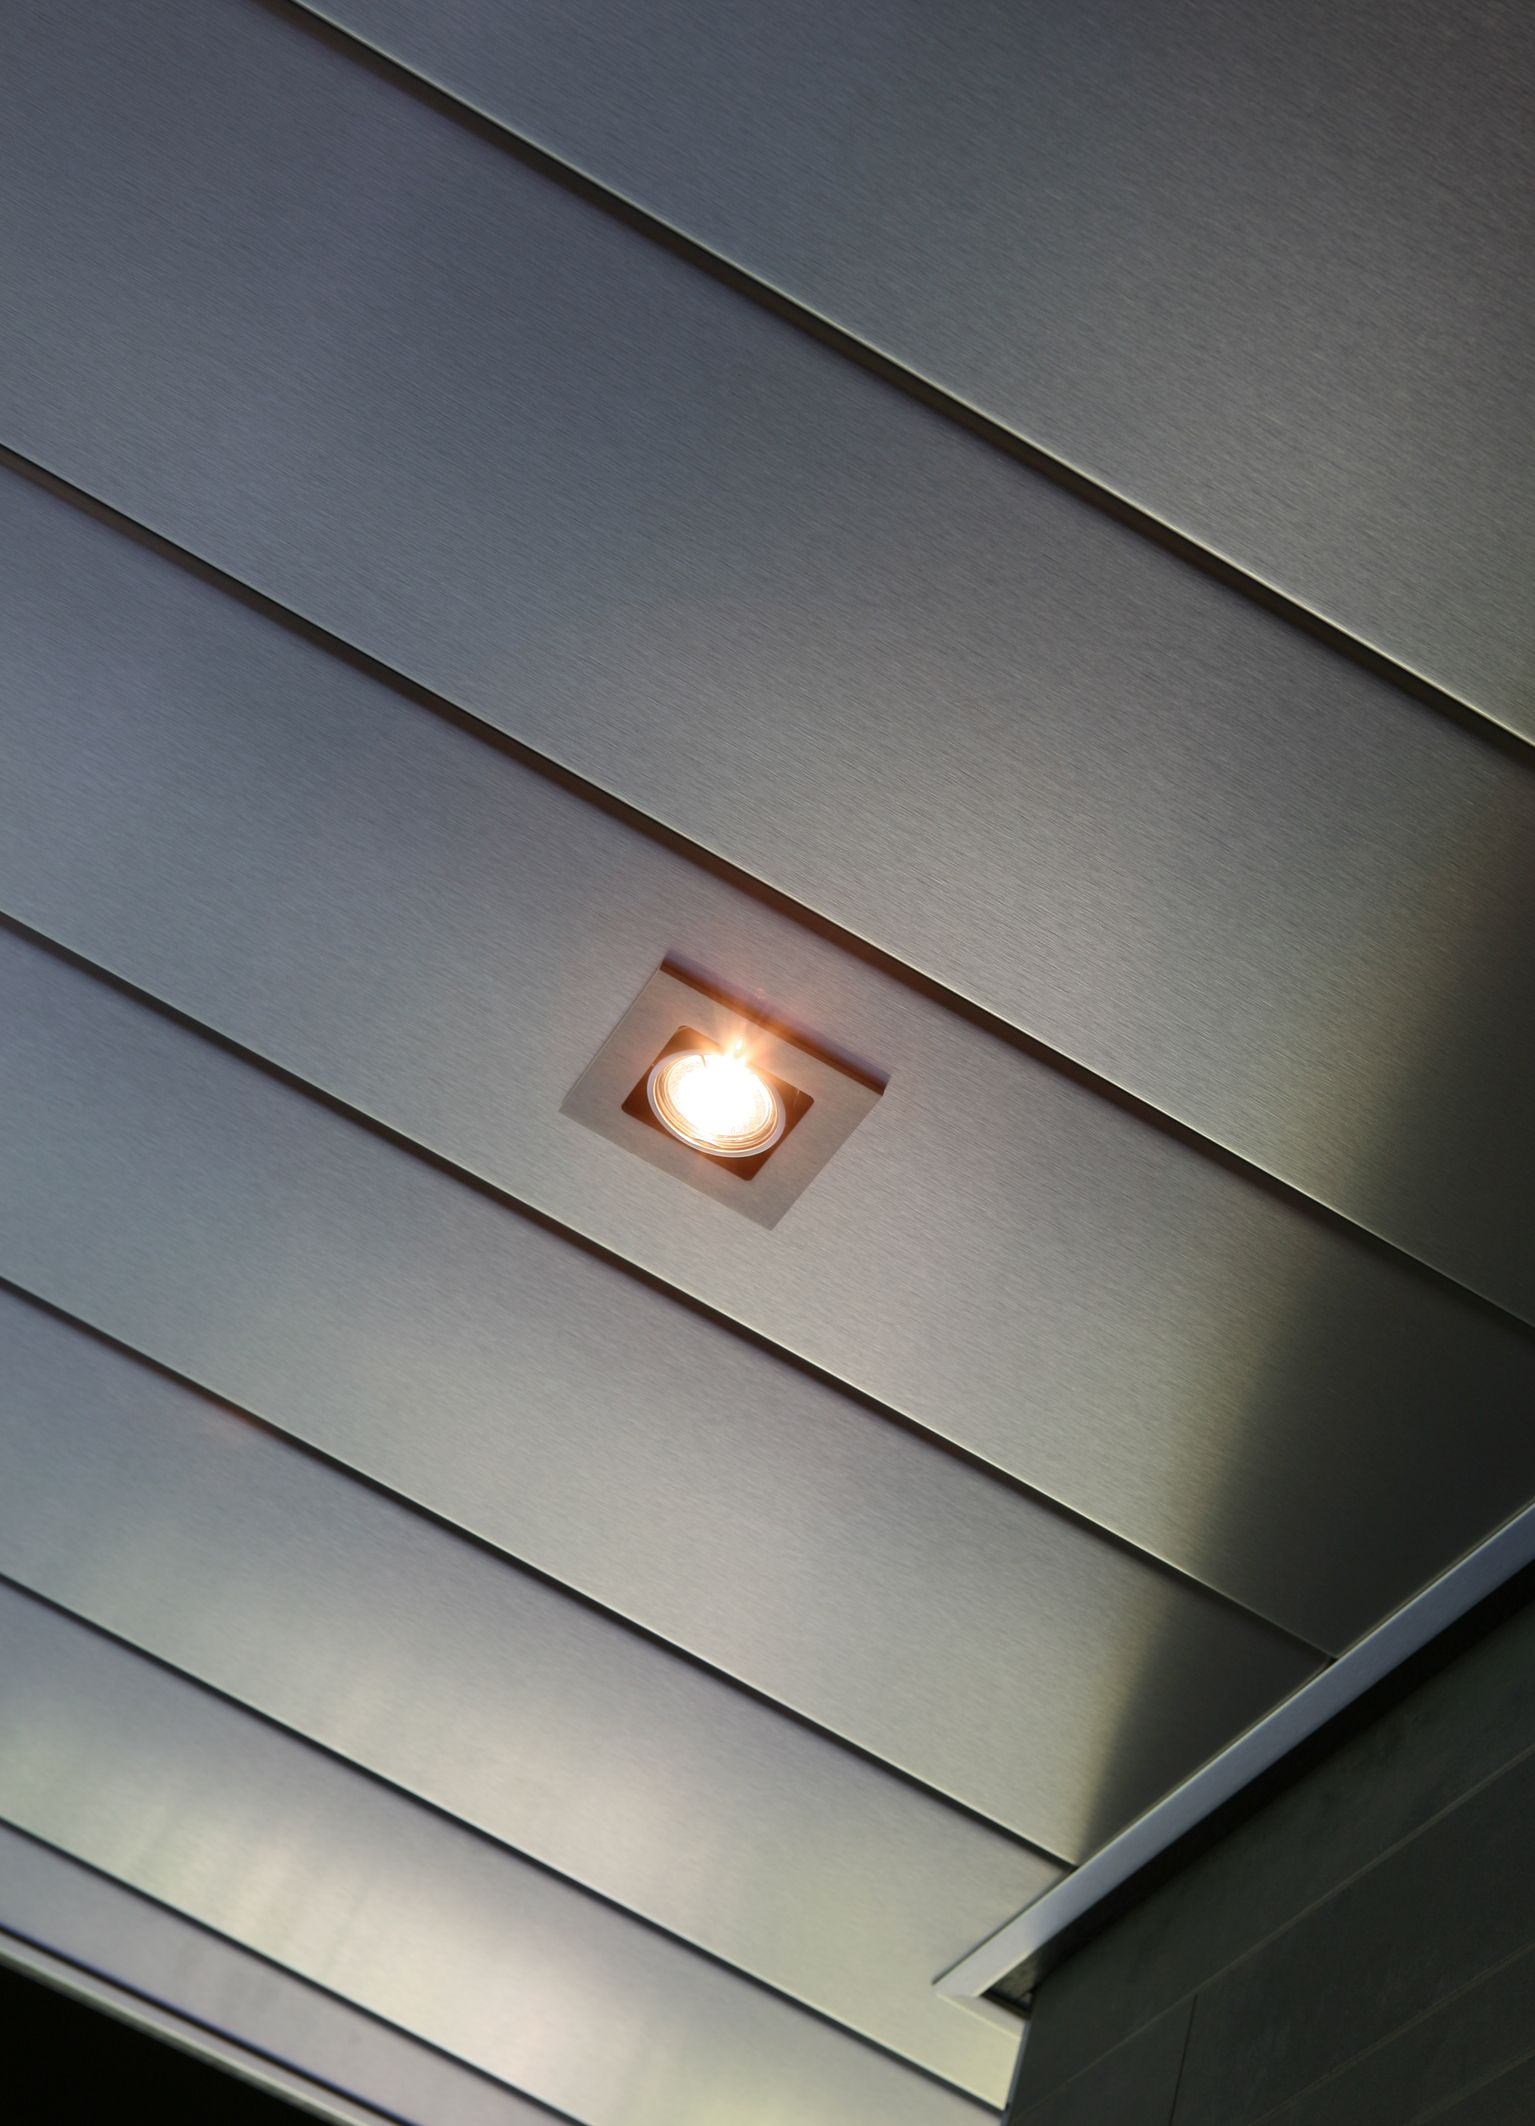 Aluminium luxalon badkamer plafond met ingebouwde led verlichting plafond pinterest - Bed plafond ...